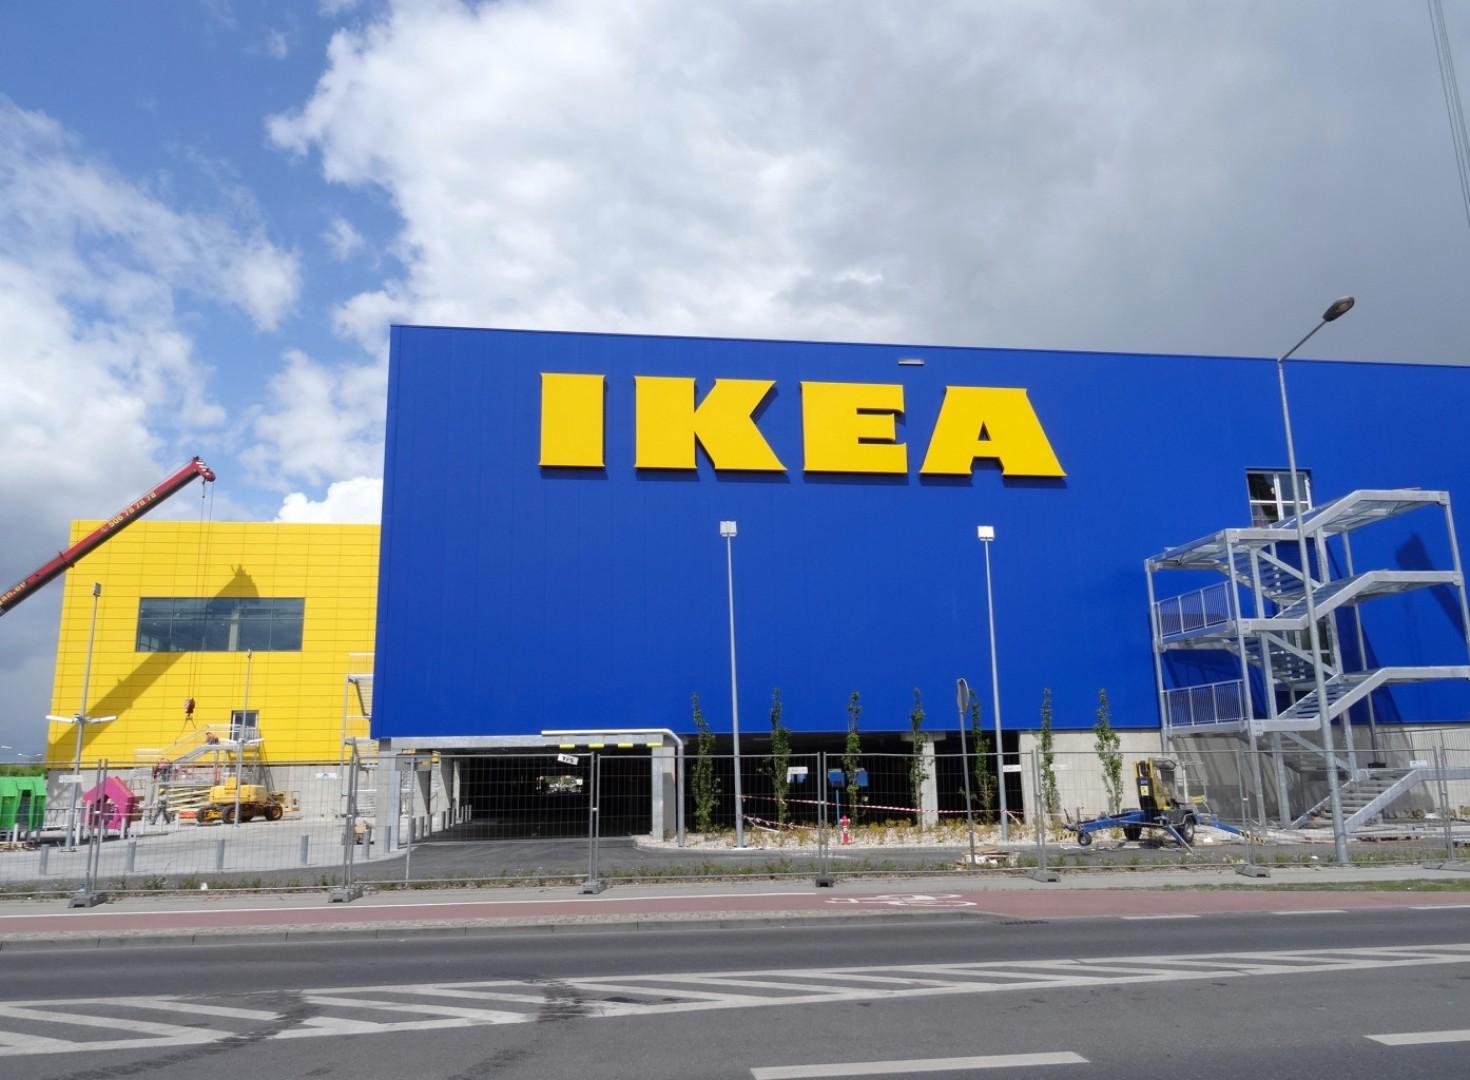 IKEA. Fot Wikimedia